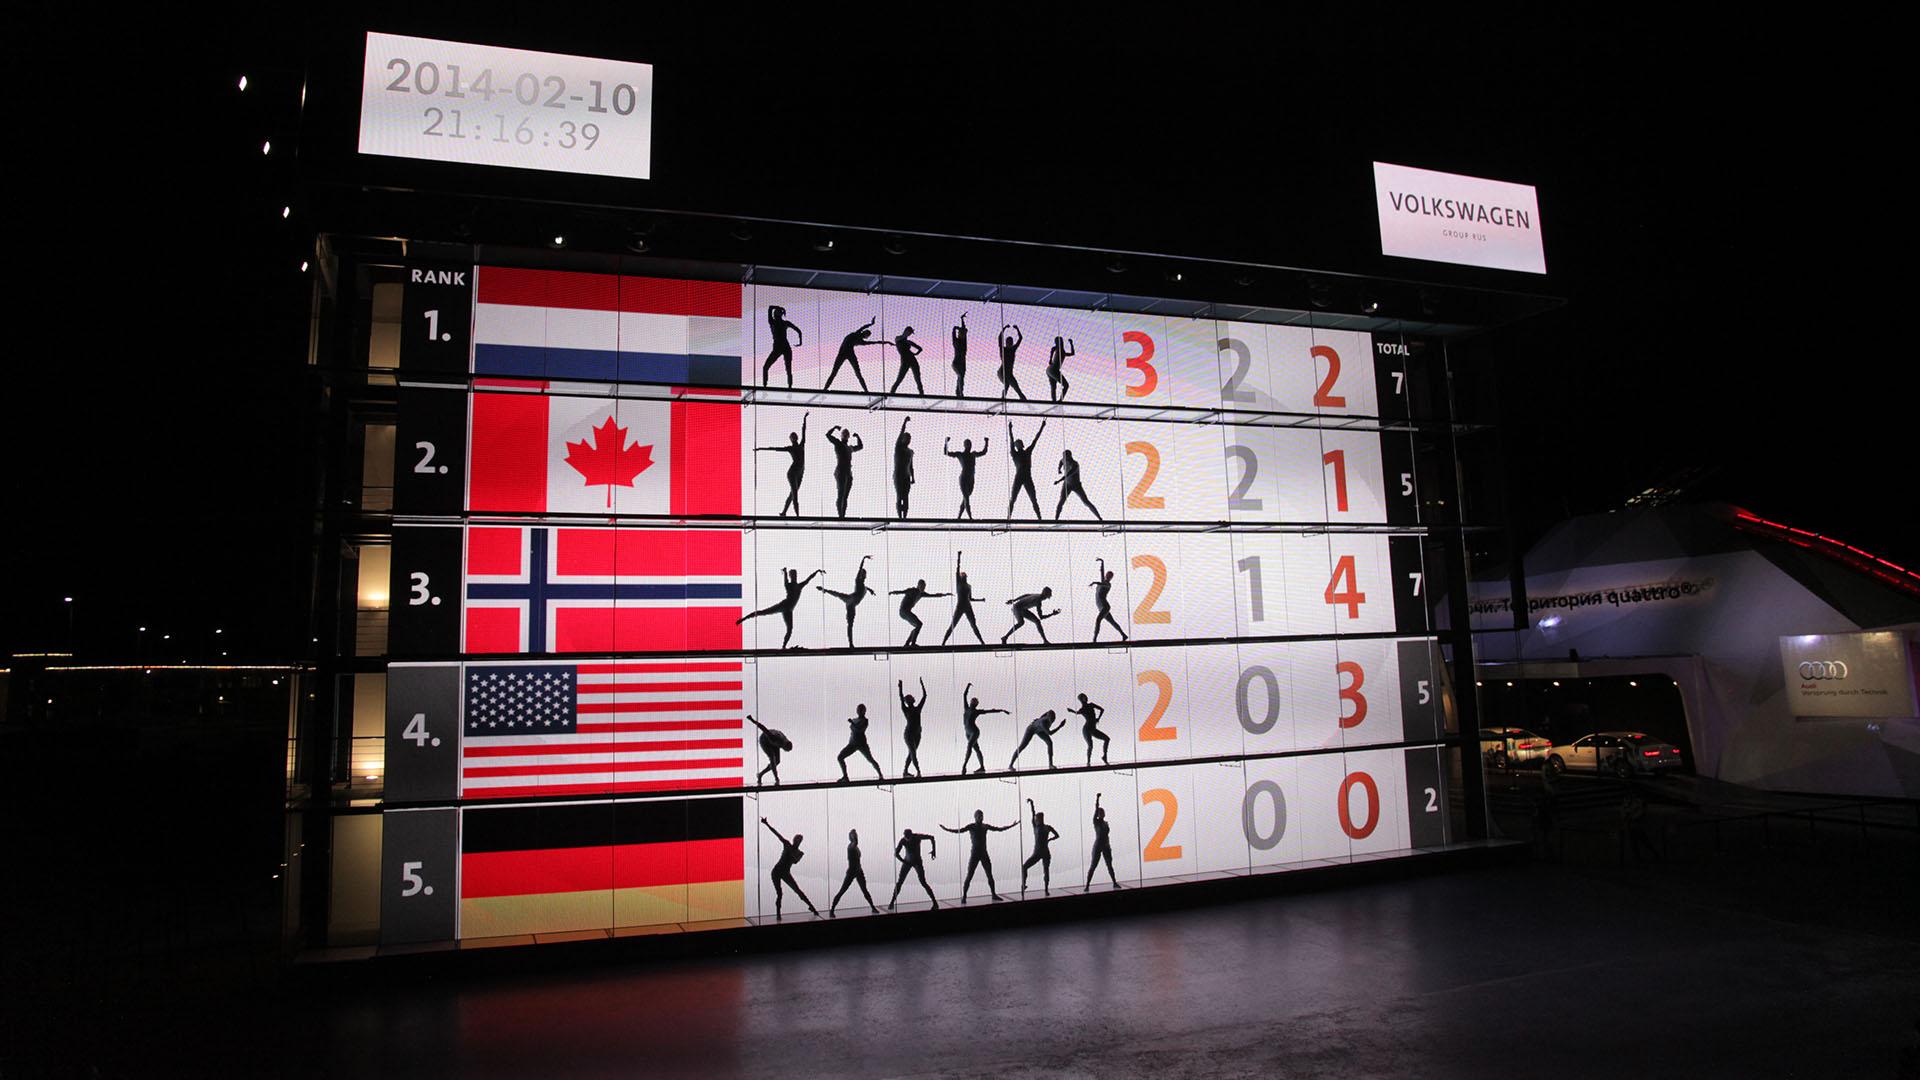 Living Medal Count Sochi 2014 Winter Olympics 02